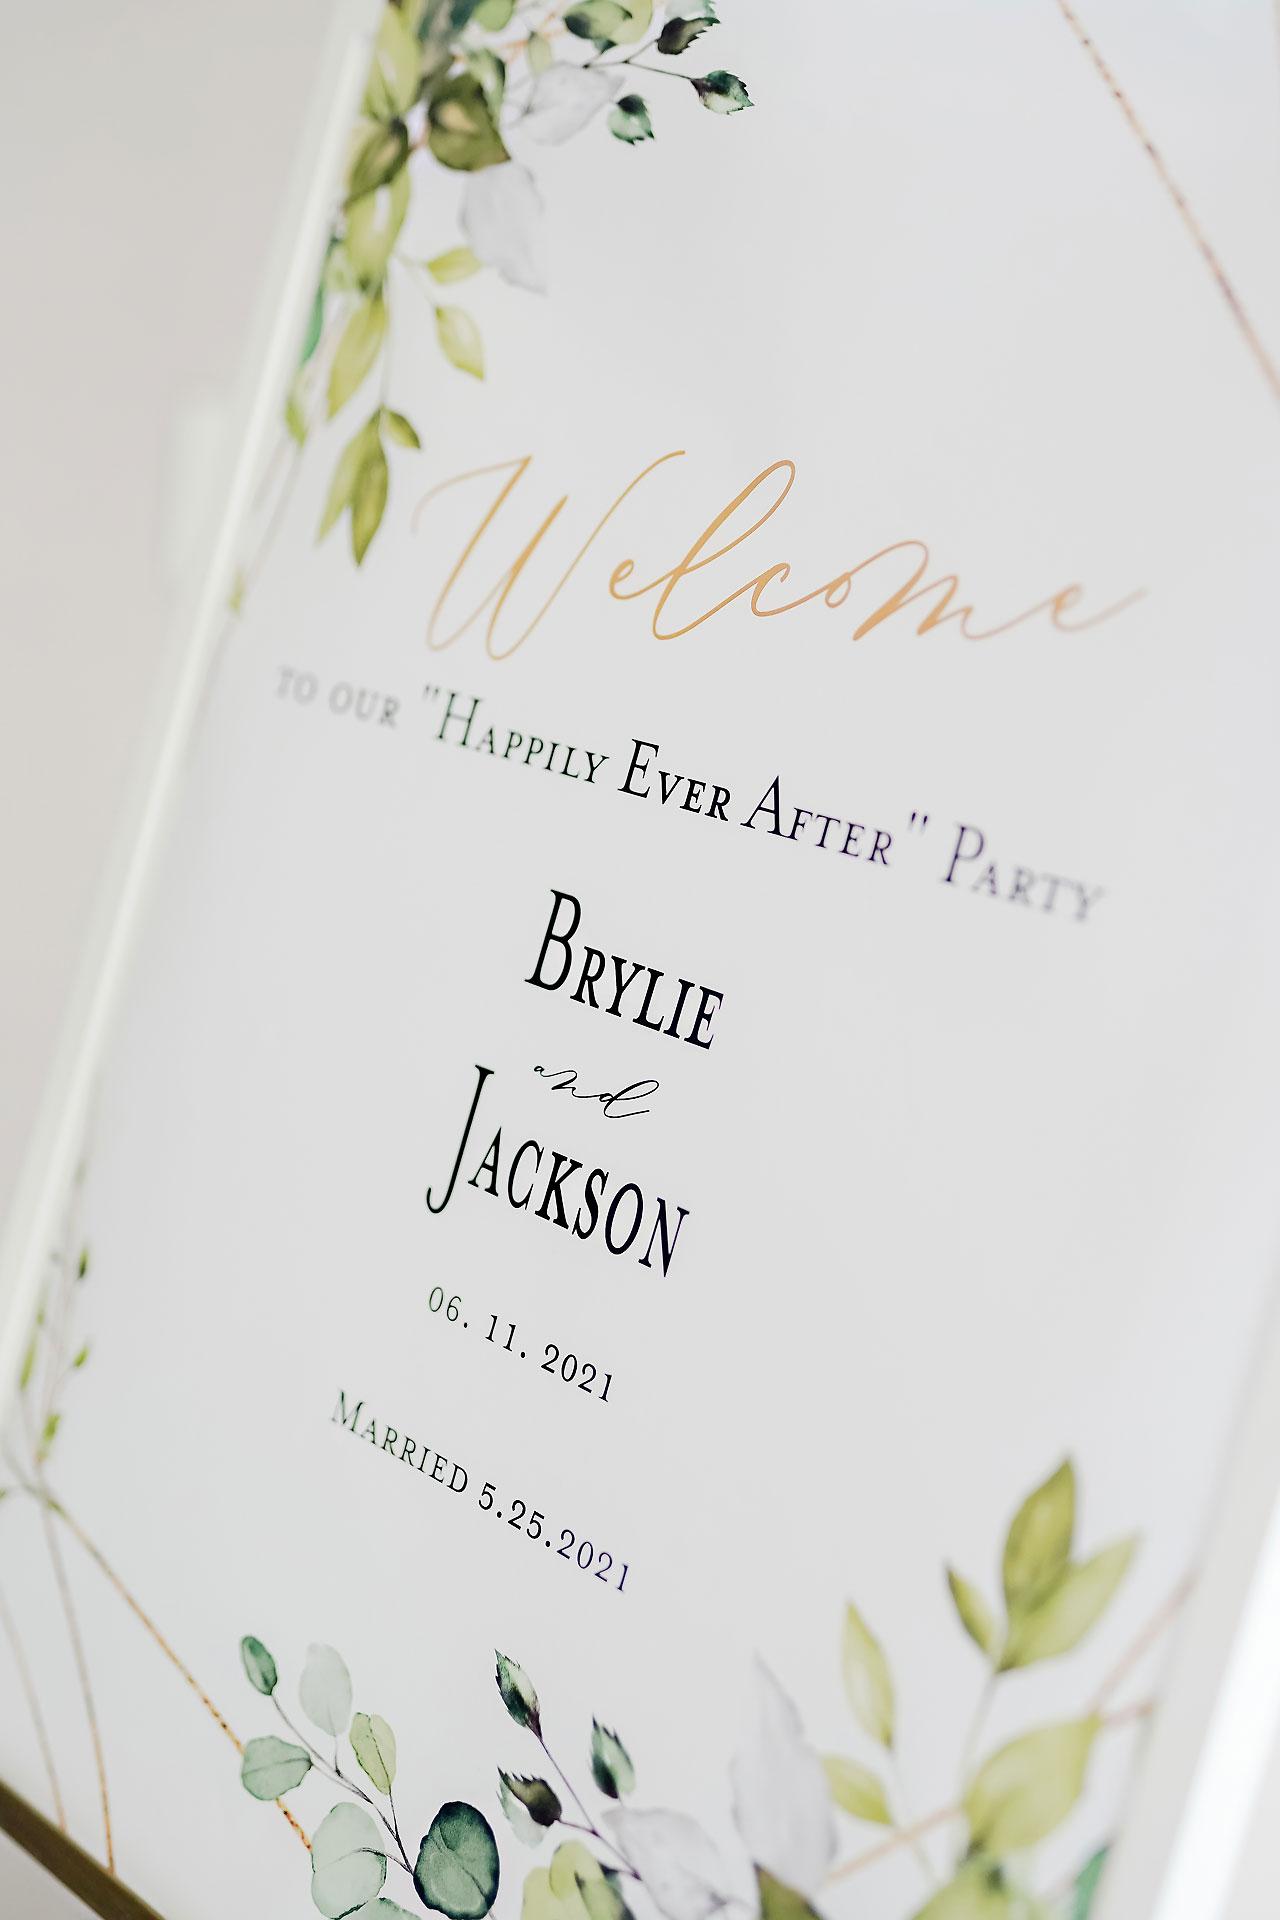 Brylie Jackson Ritz Charles Carmel Indiana Wedding Reception 002